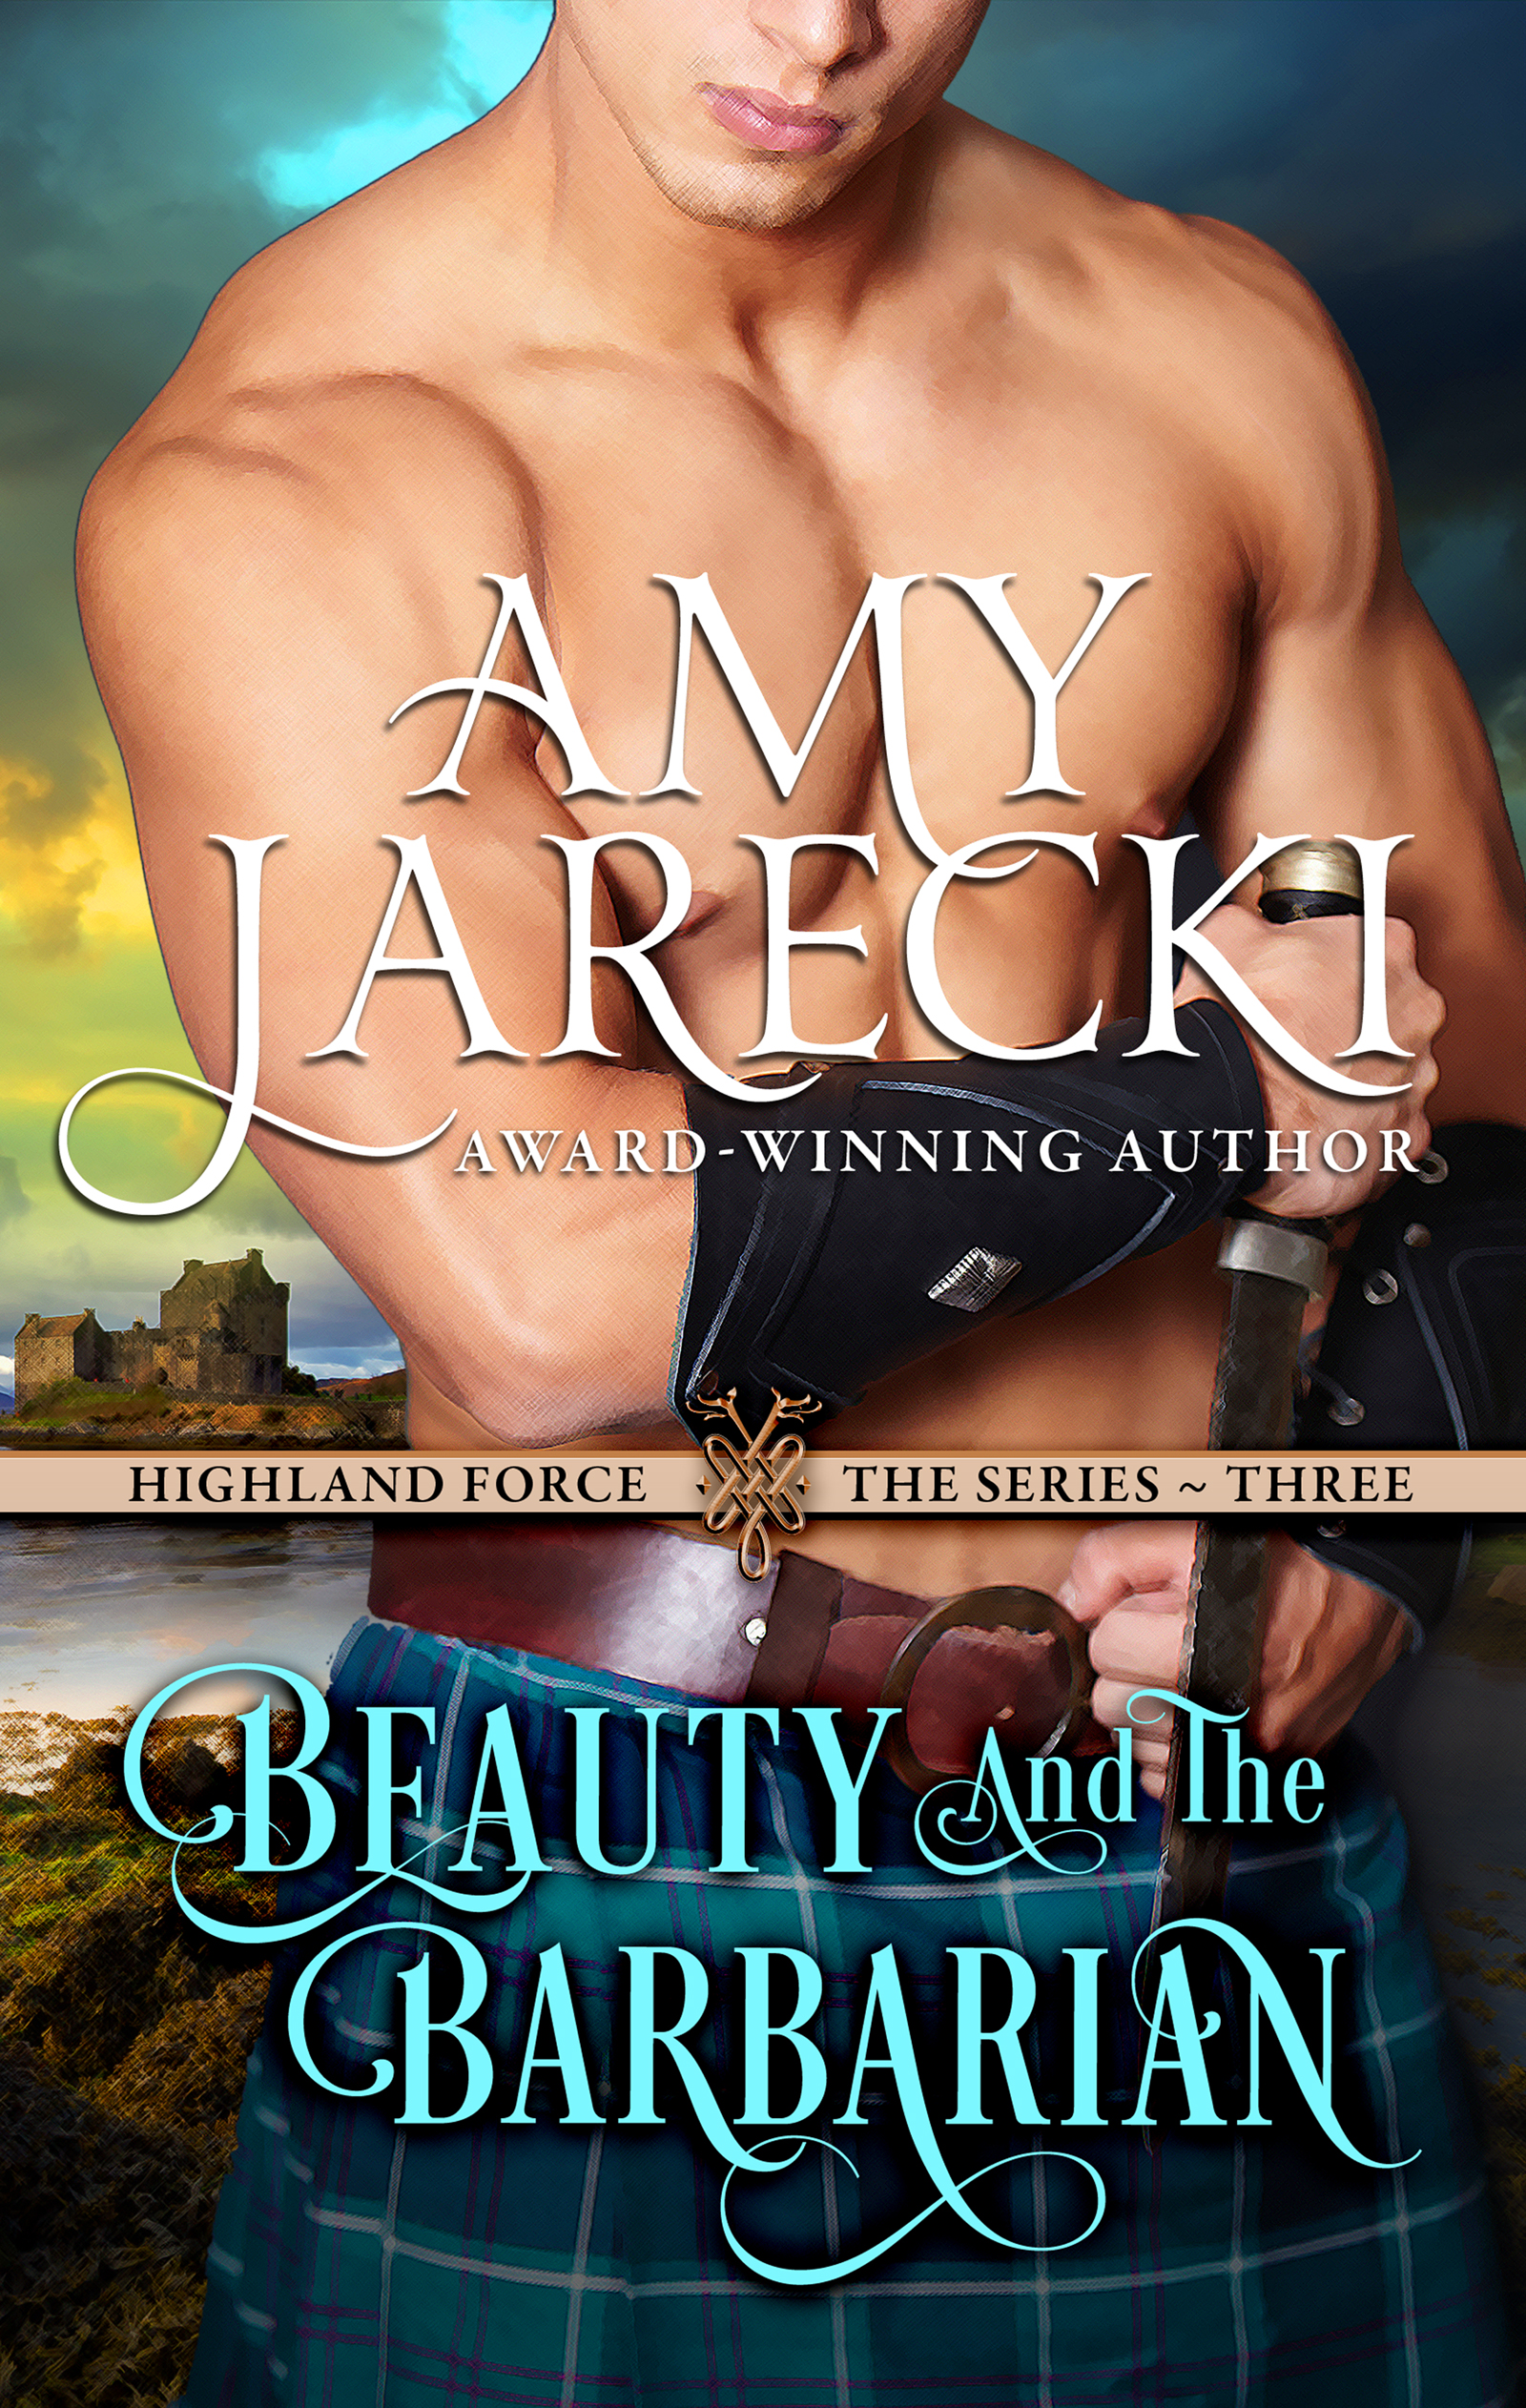 Amy Jarecki - Beauty and the Barbarian (Scottish Historical Romance)